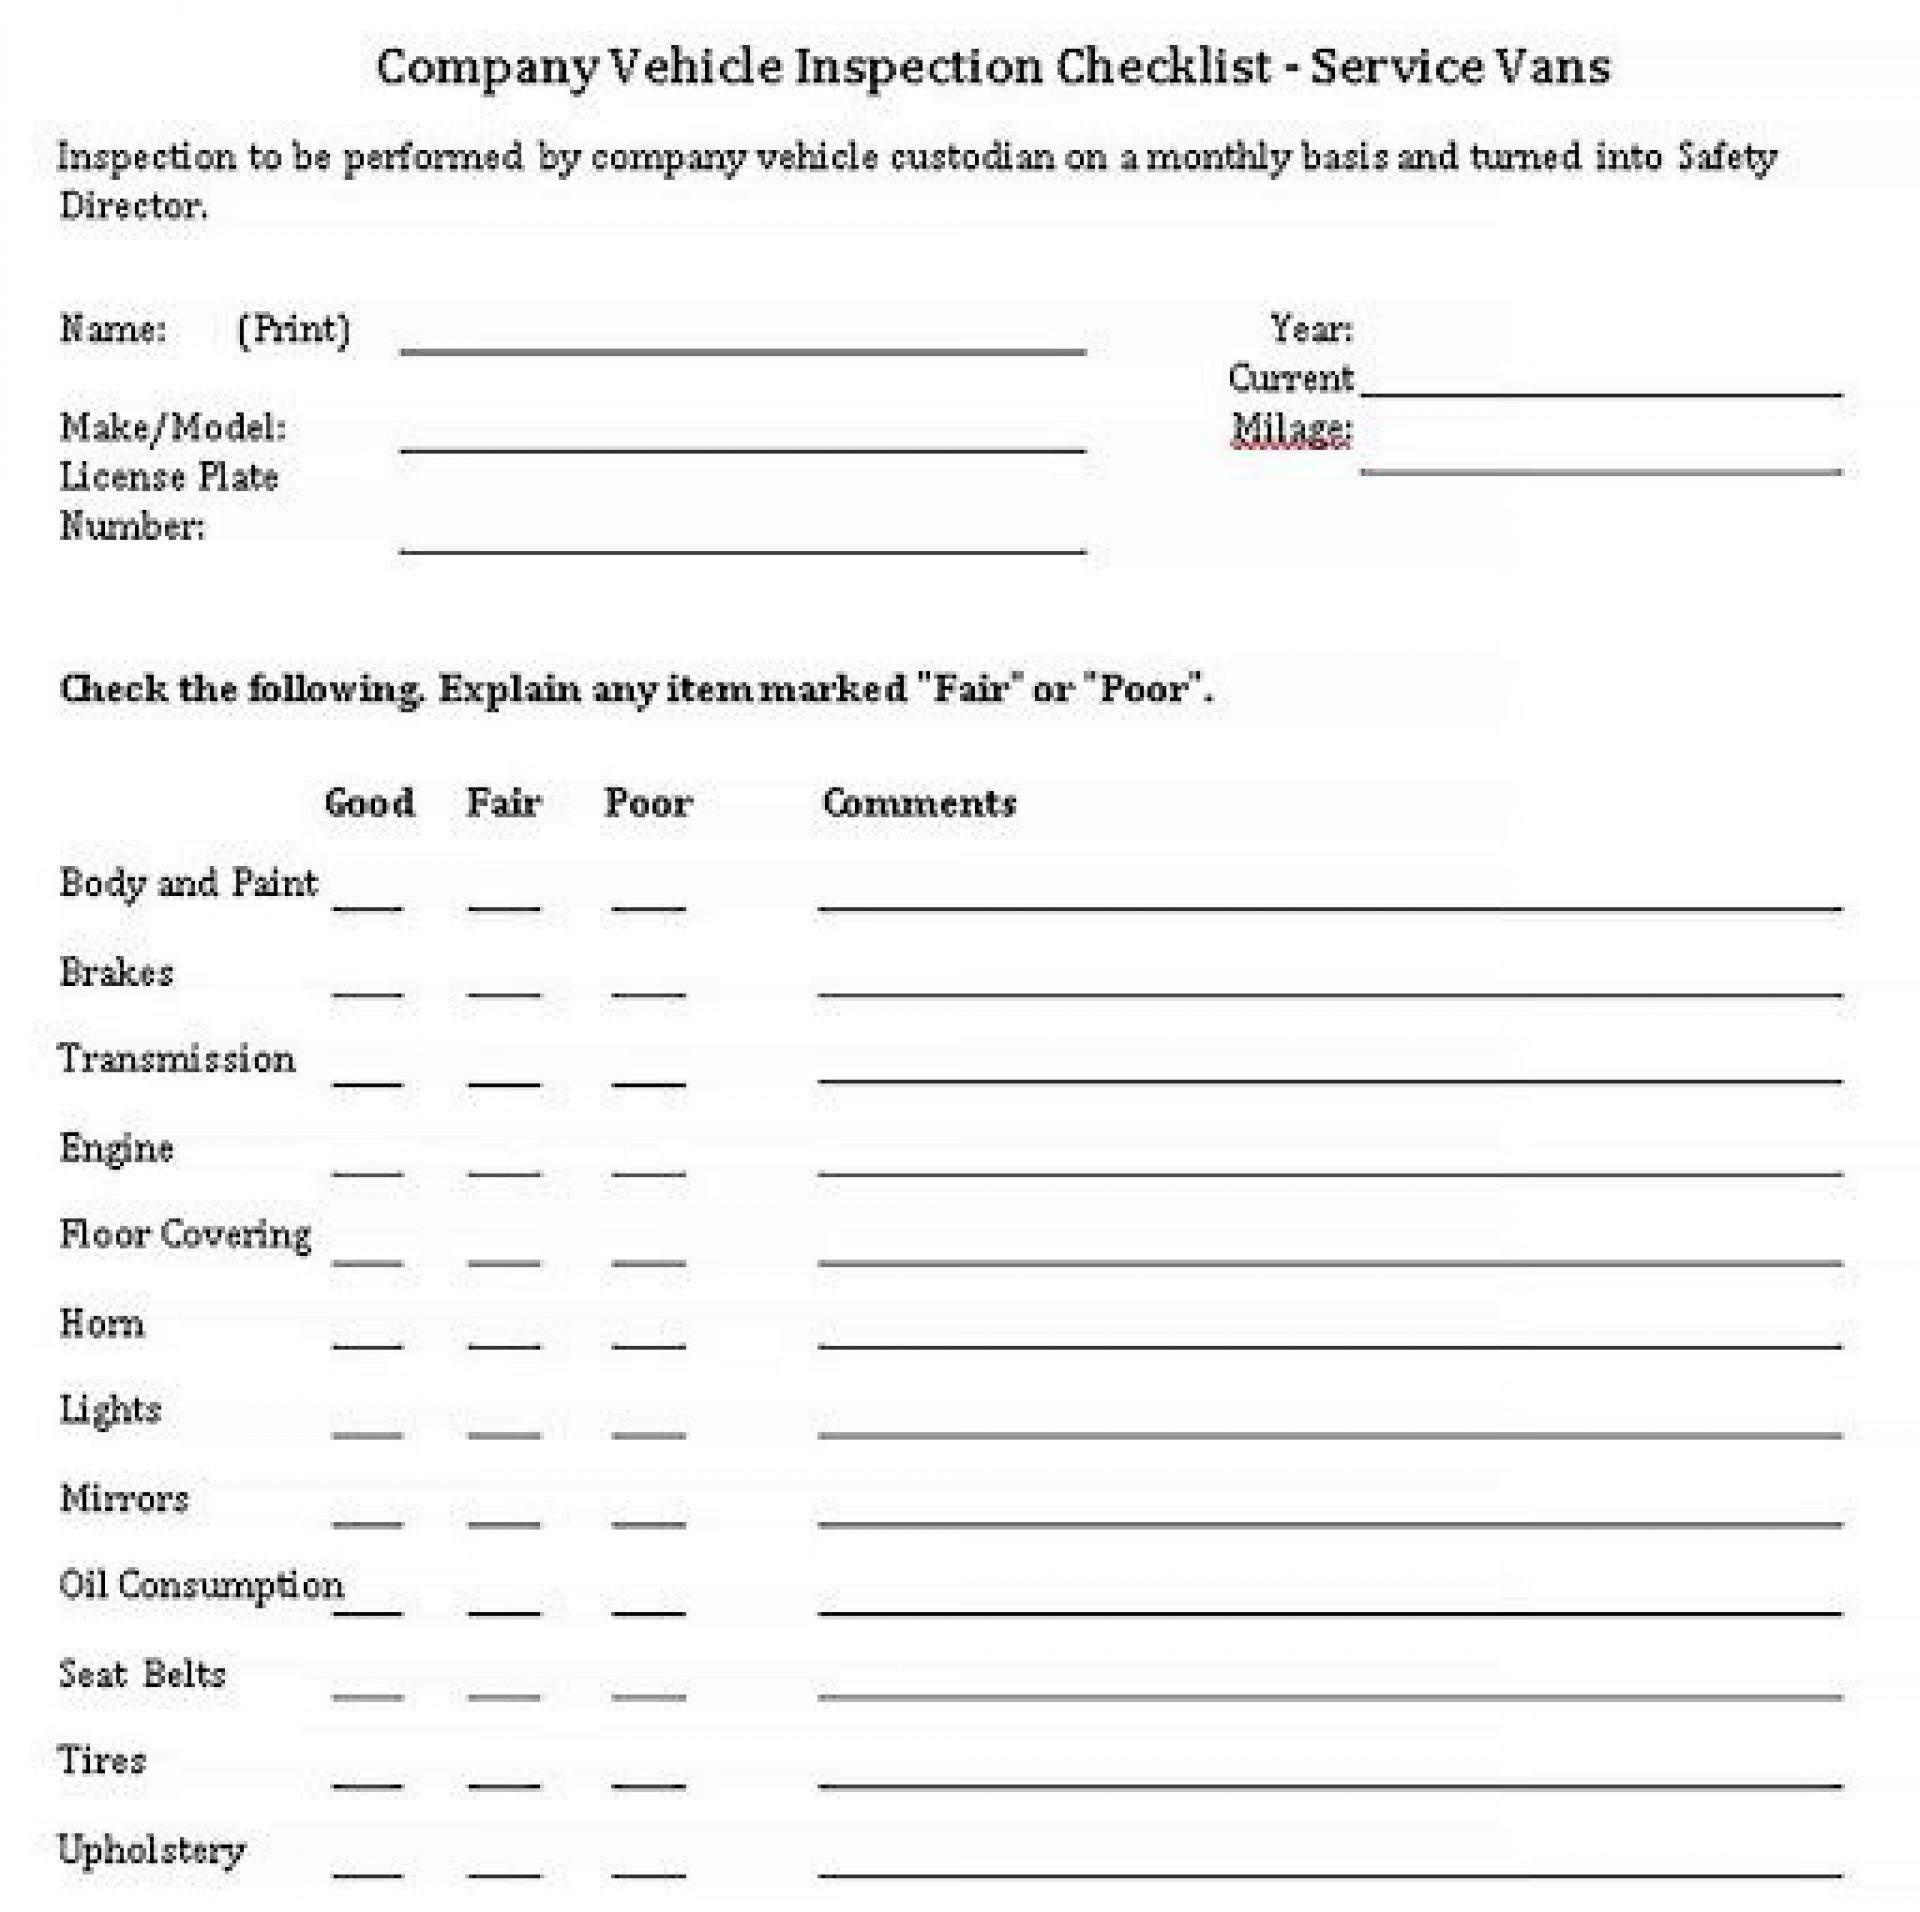 008 Singular Vehicle Inspection Form Template Doc Photo 1920